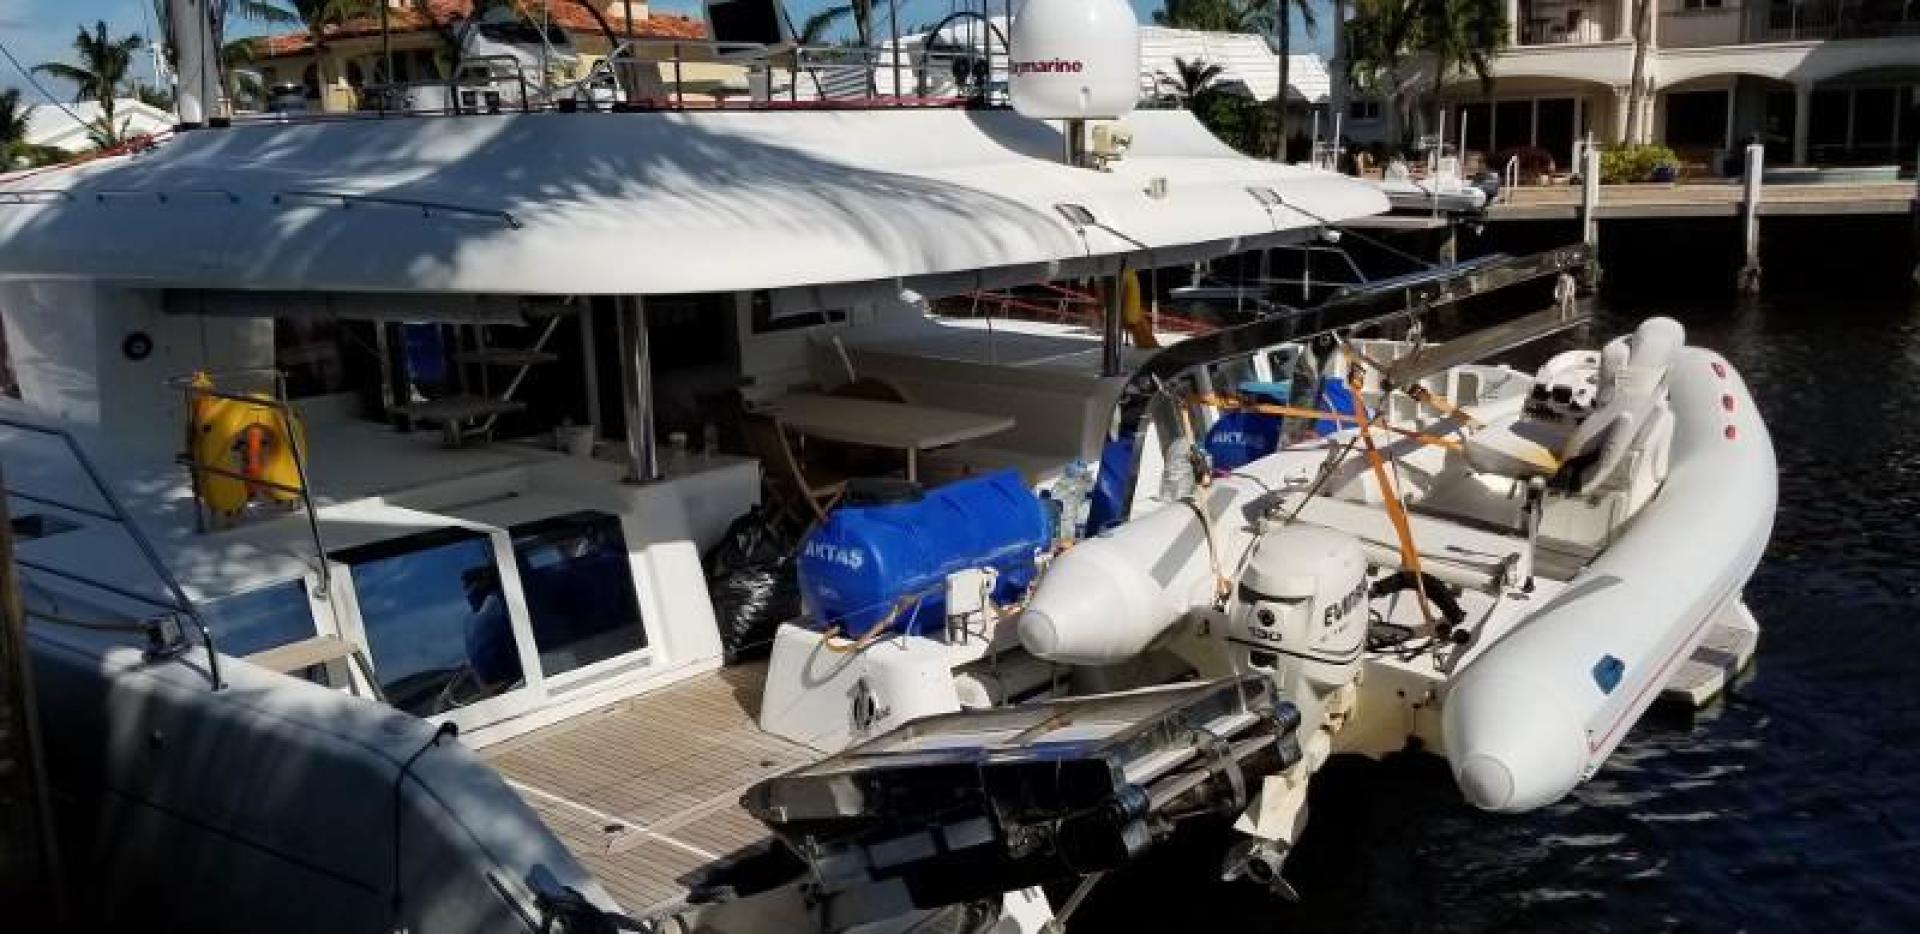 Lagoon-620 2011-Princess Hera Fort Lauderdale-Florida-United States-303759 | Thumbnail